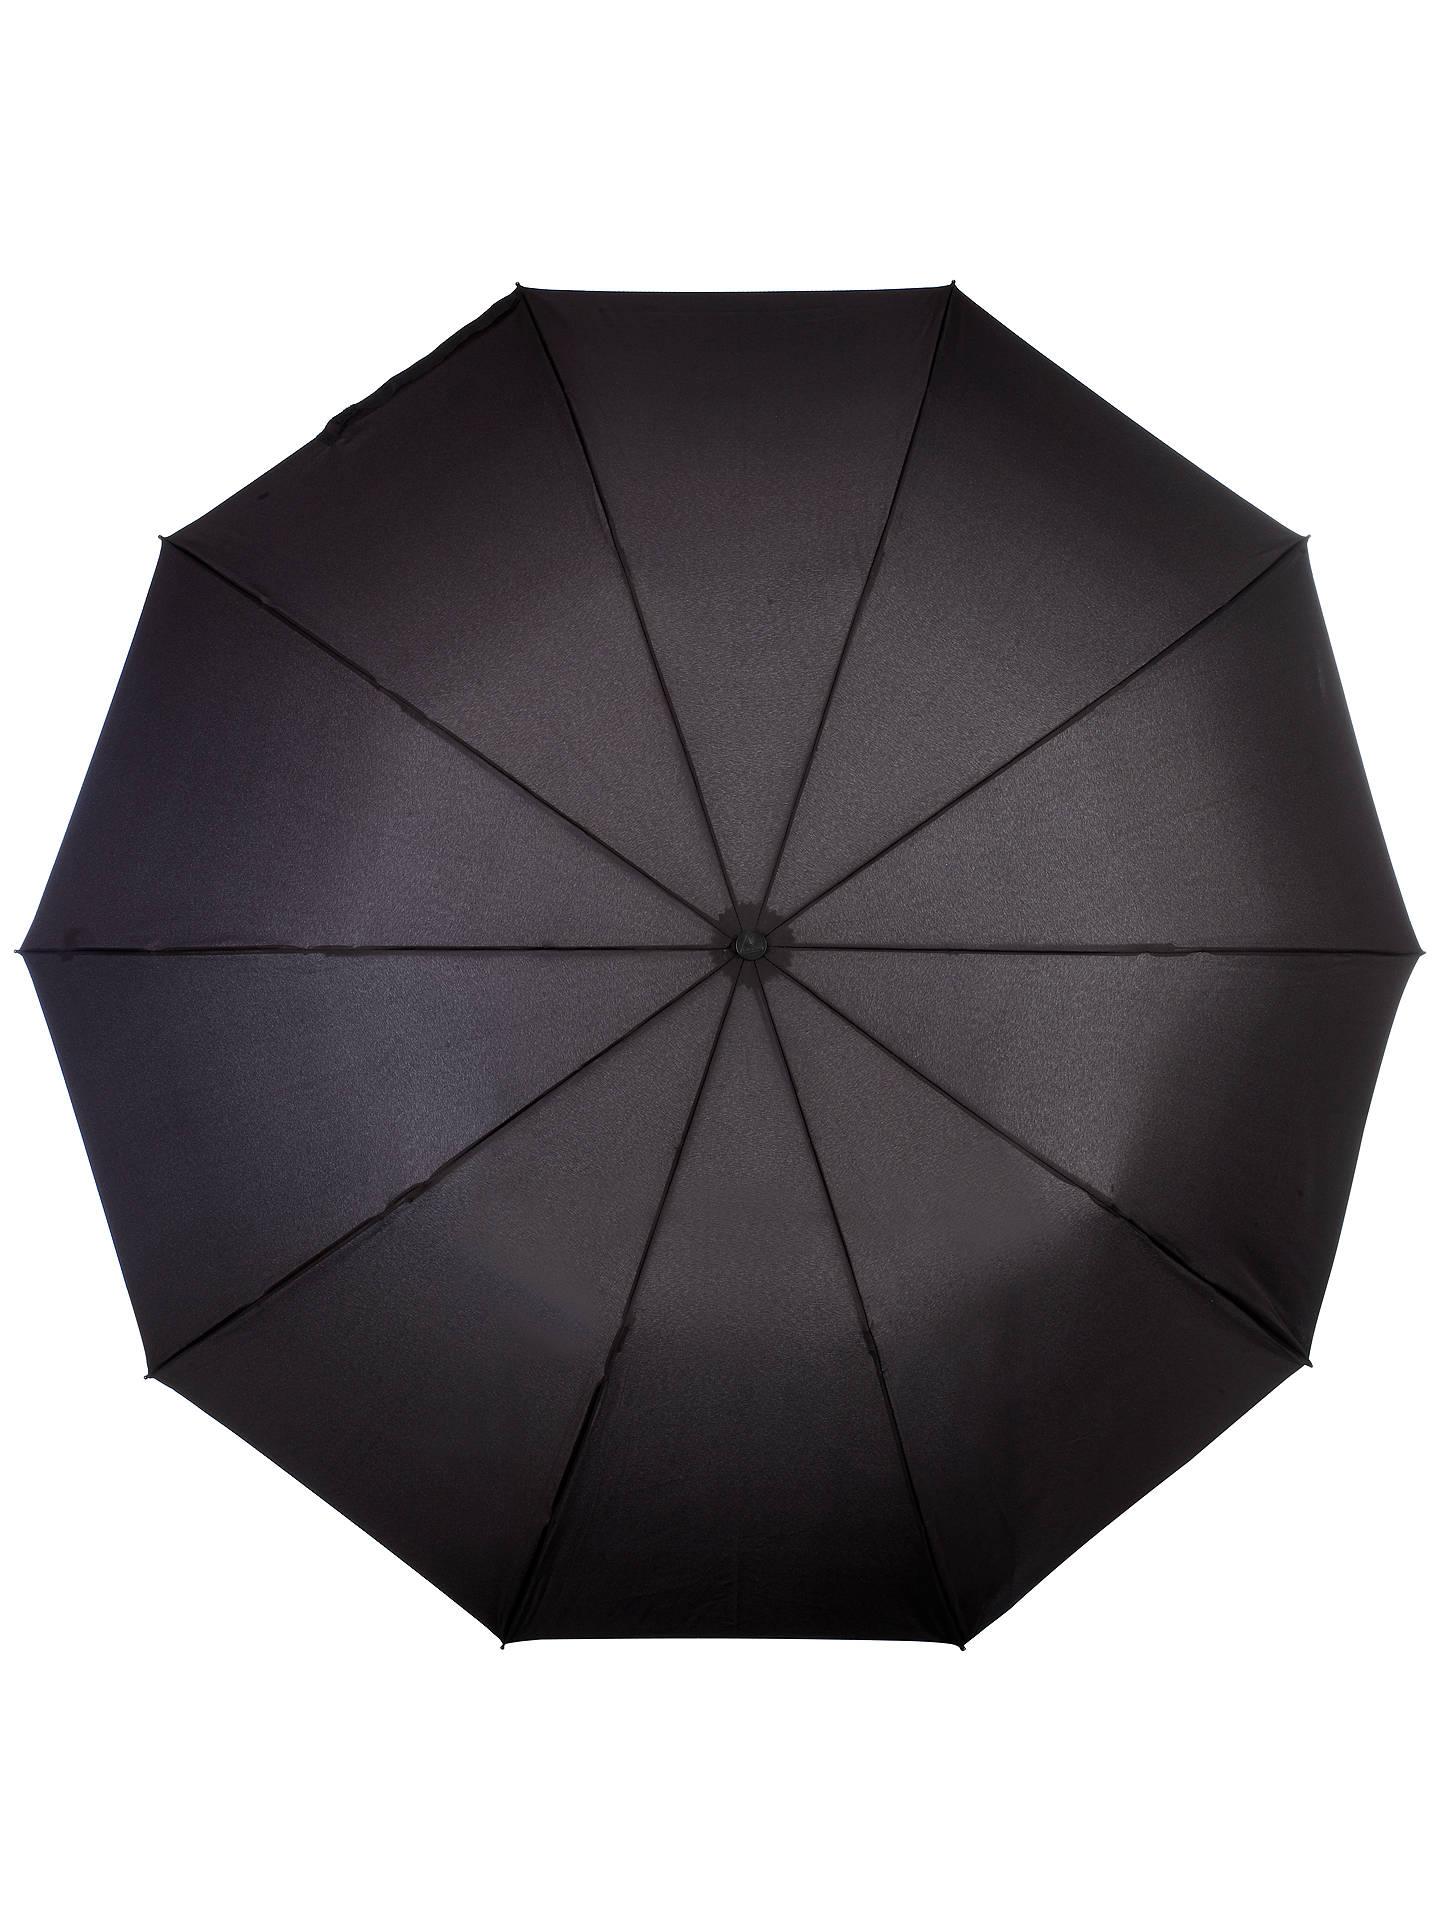 6becf5c97d5f Fulton Magnum Automatic Folding Umbrella, Black